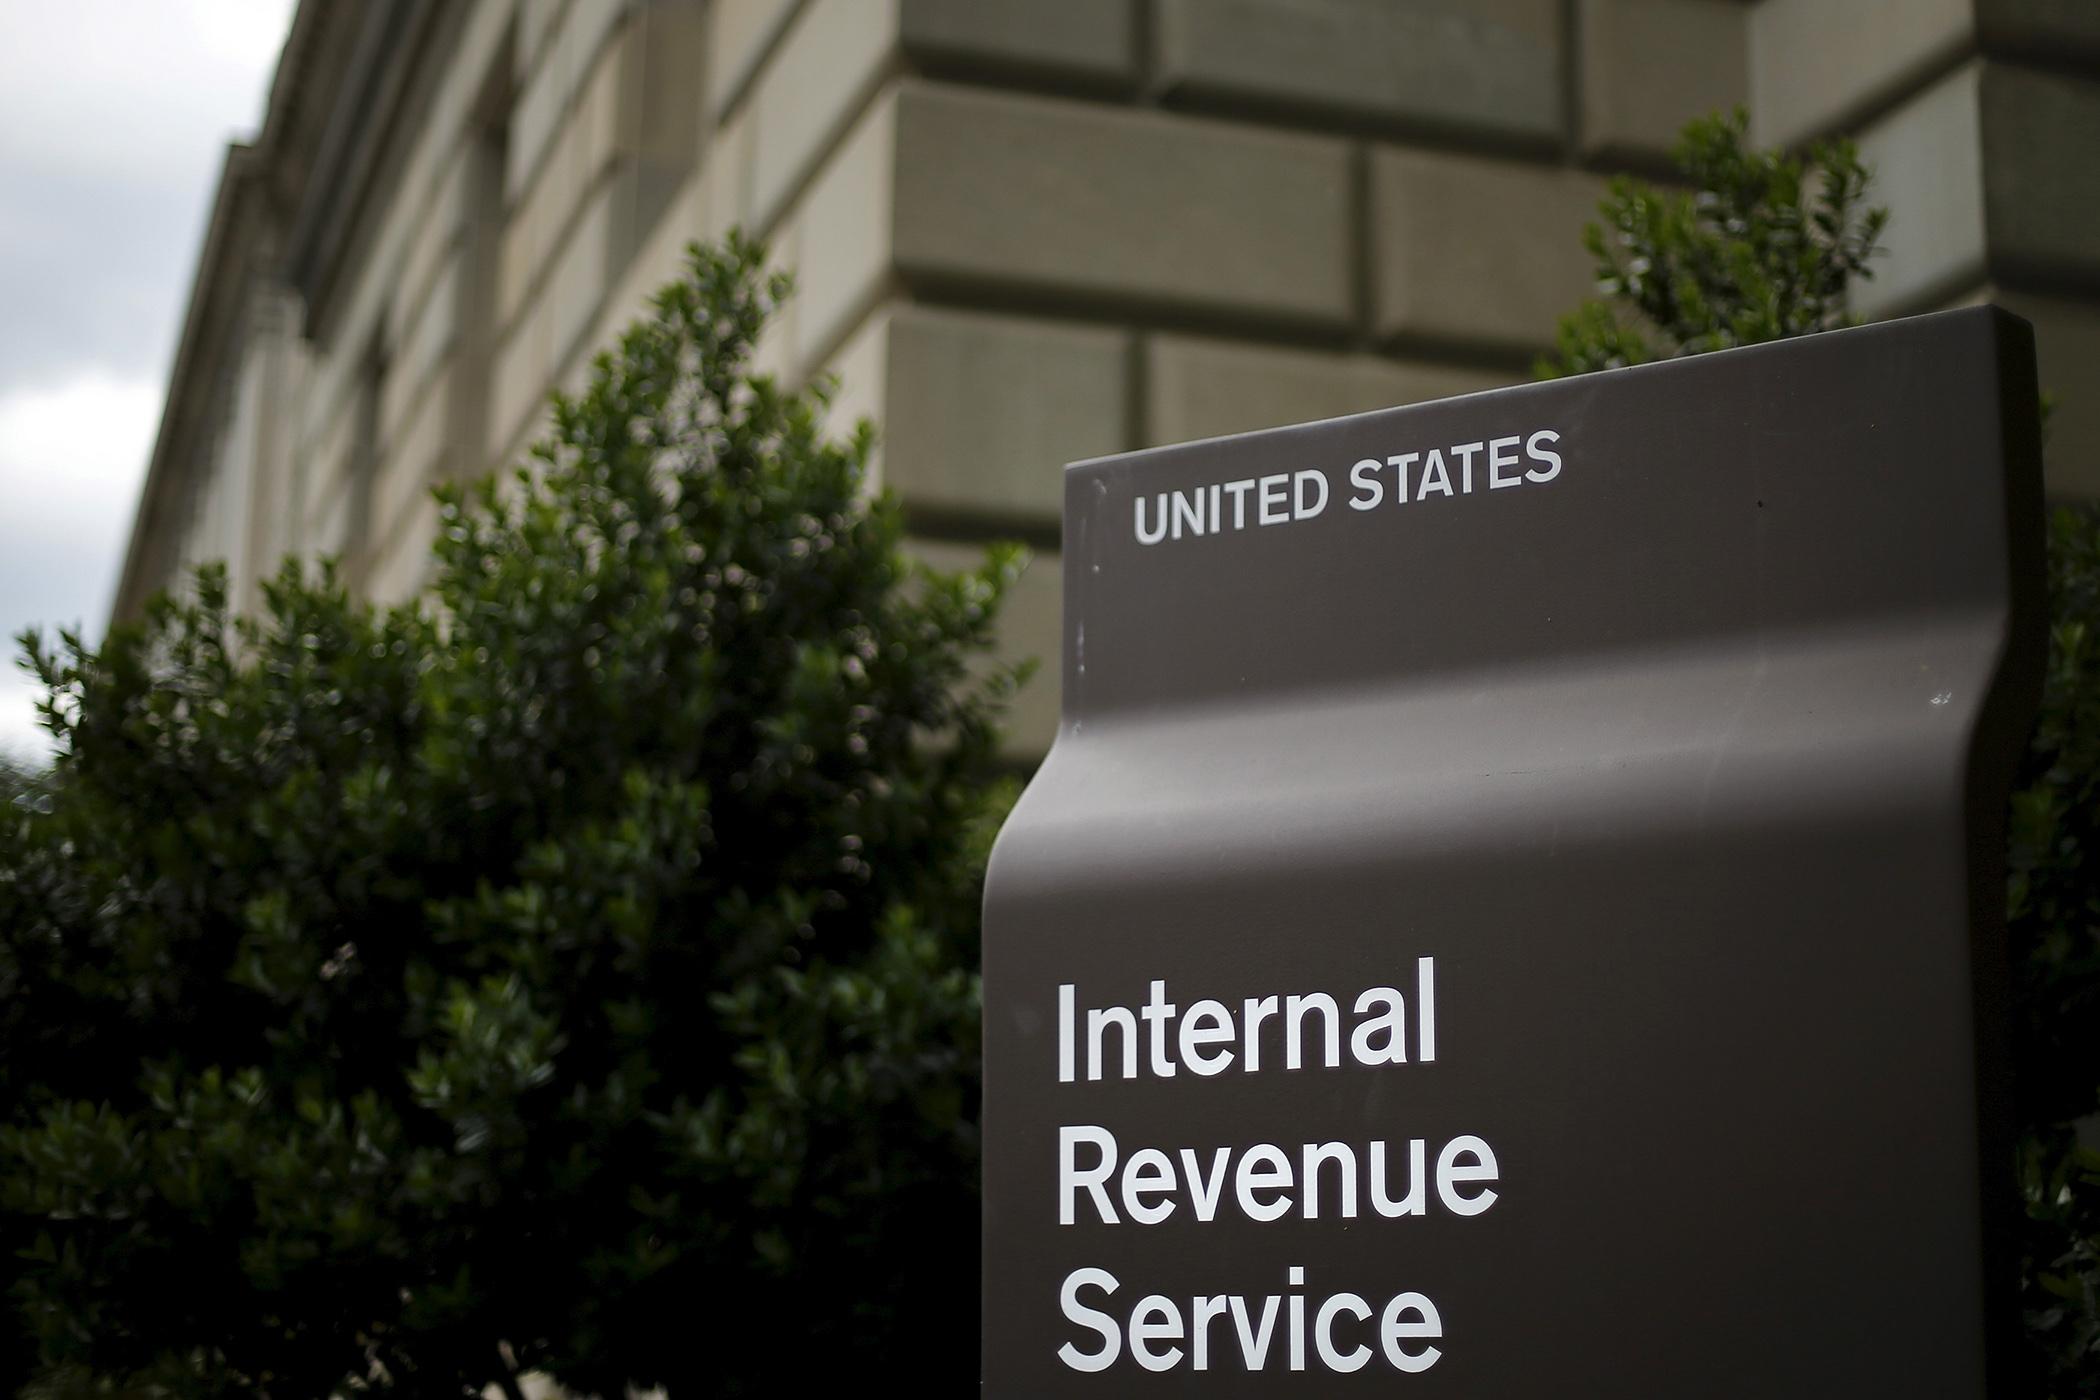 The U.S. Internal Revenue Service (IRS) building in Washington, May 27, 2015